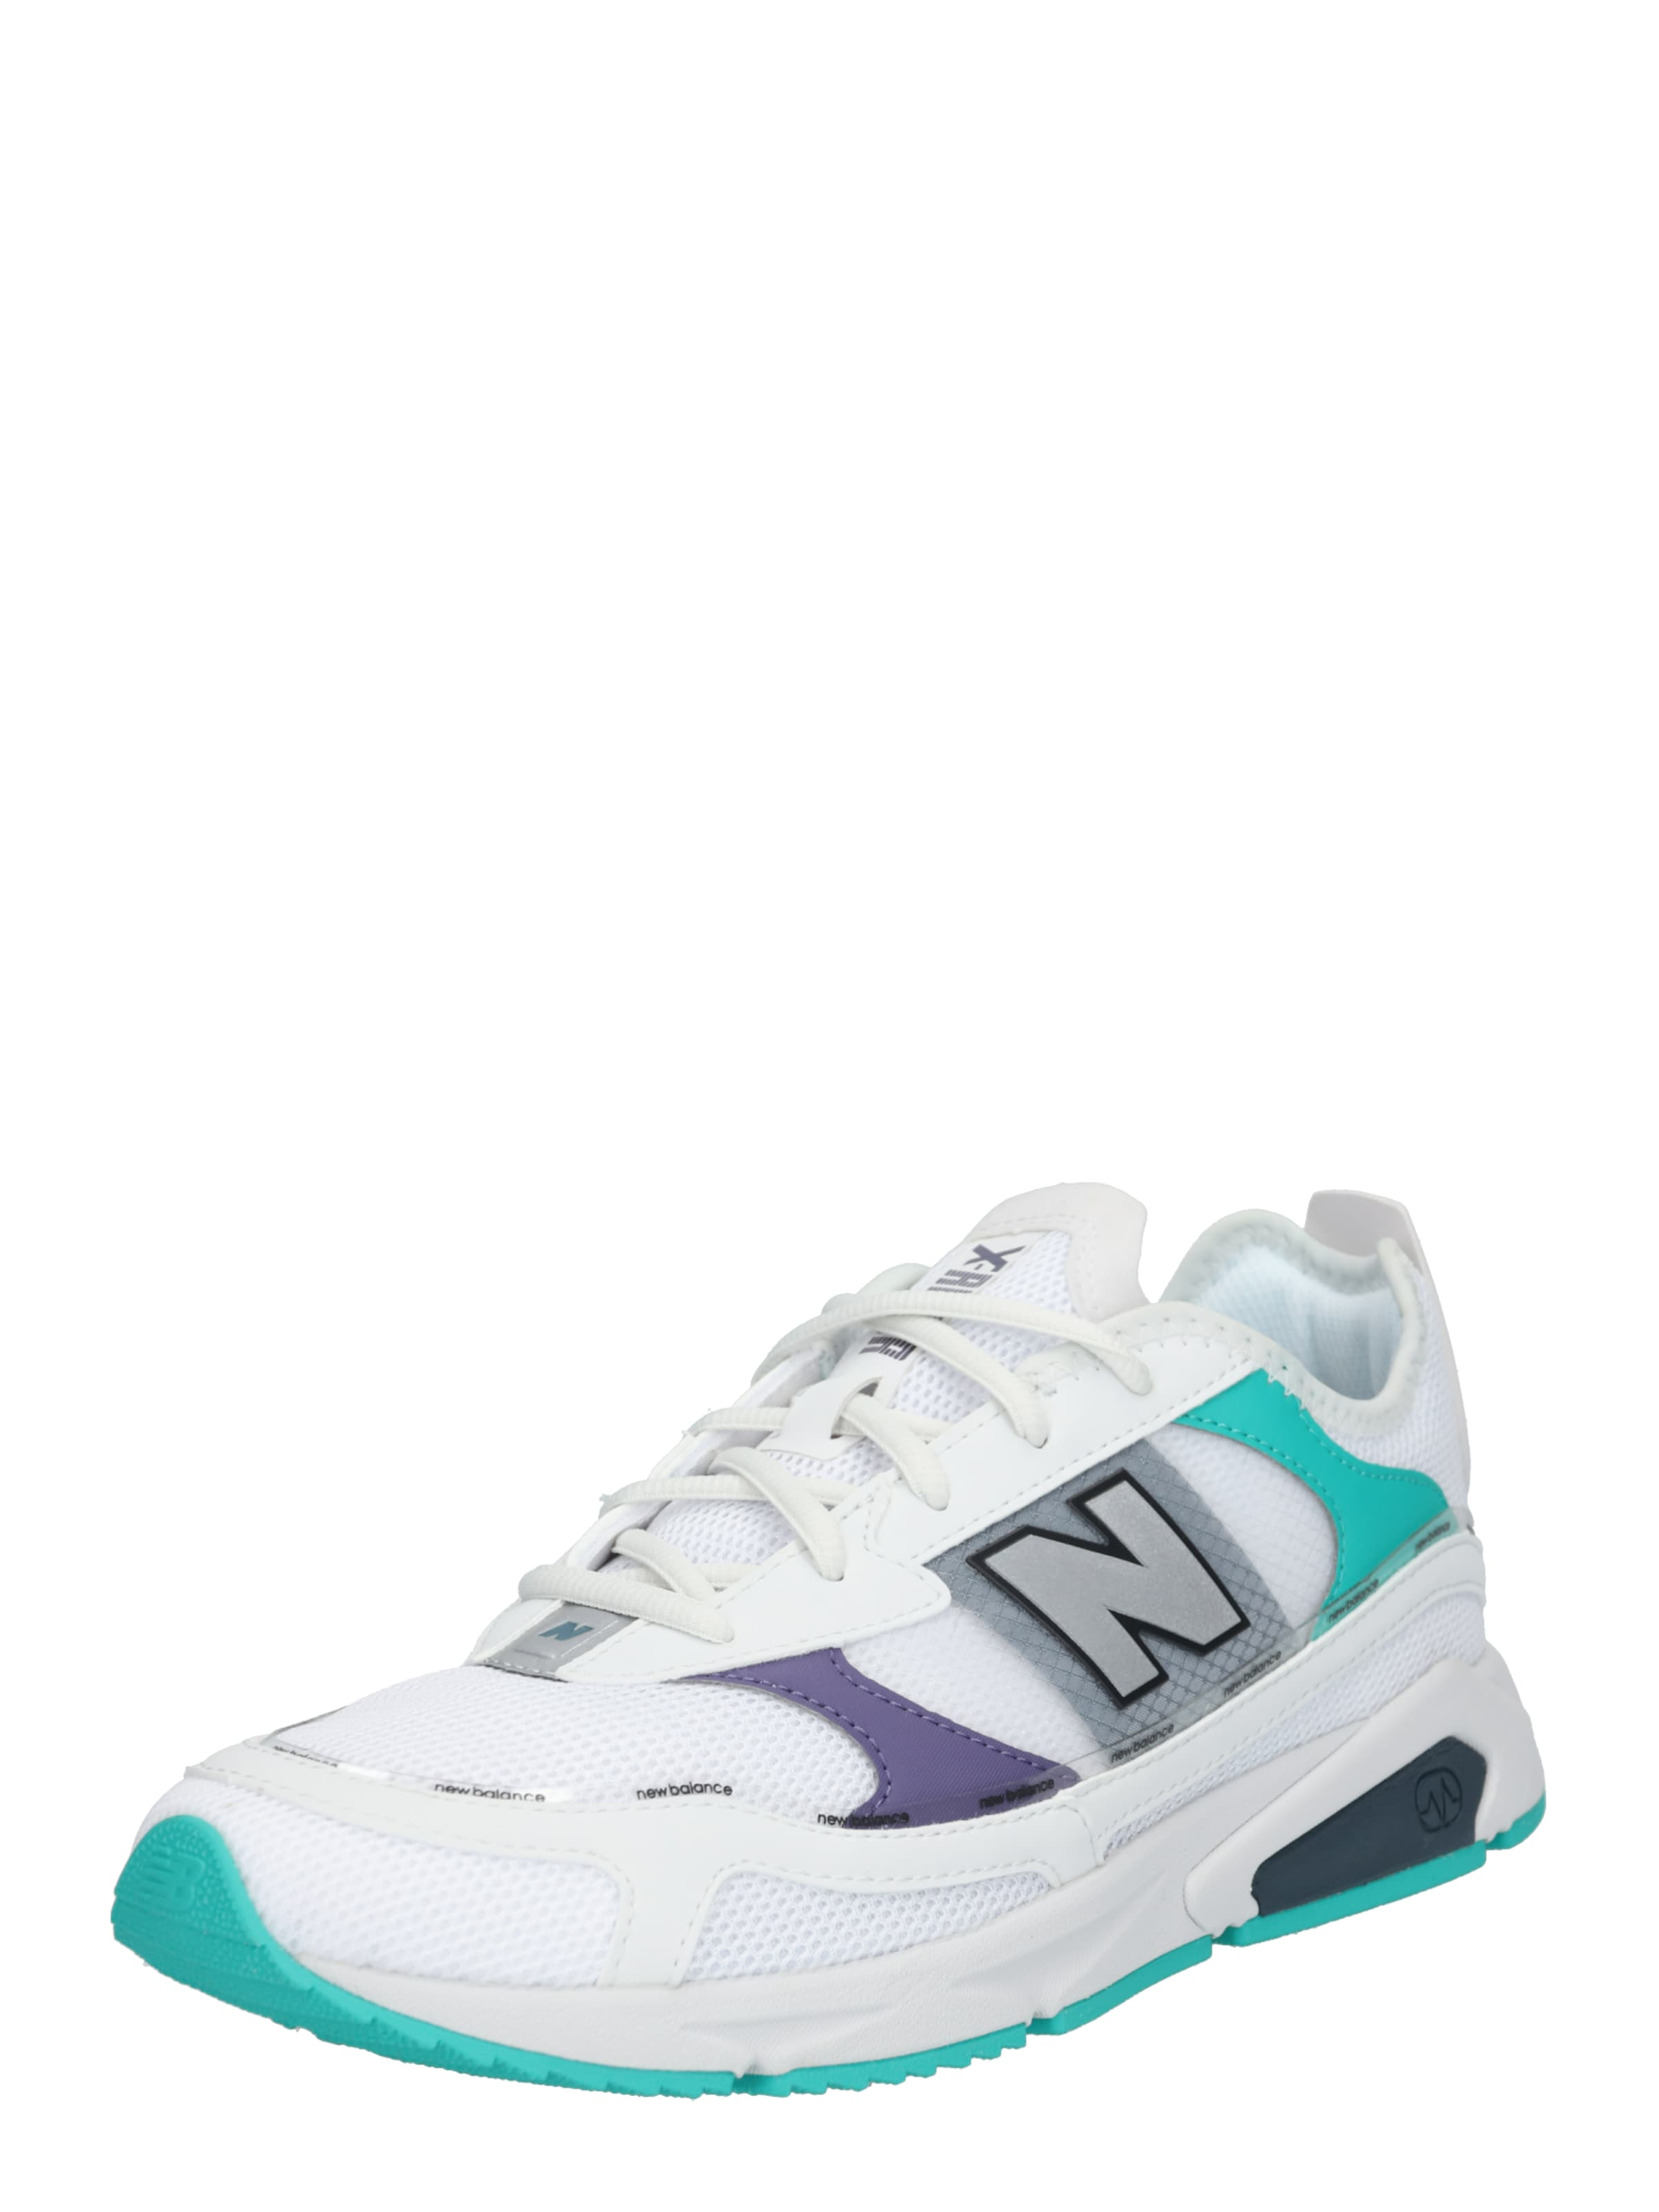 Sneaker Balance In New LilaSchwarz 'msxrchl' Y9bWDH2IeE